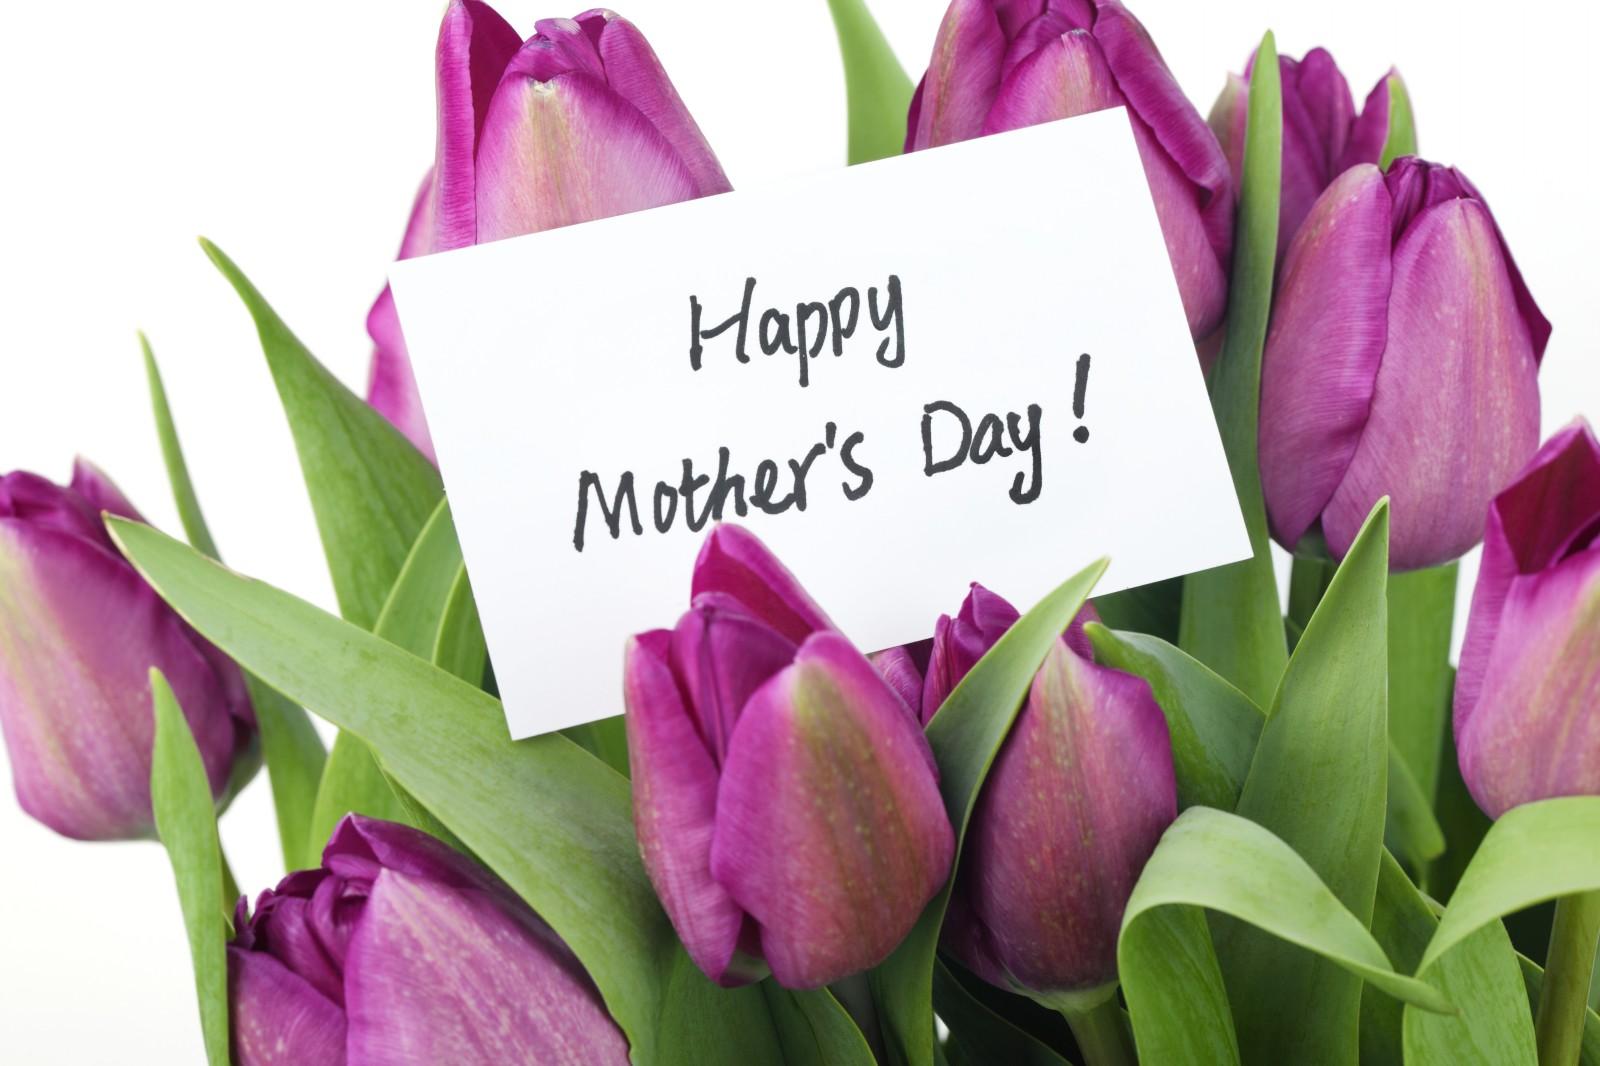 happy mothers day wishes 12 happy mothers day wishes